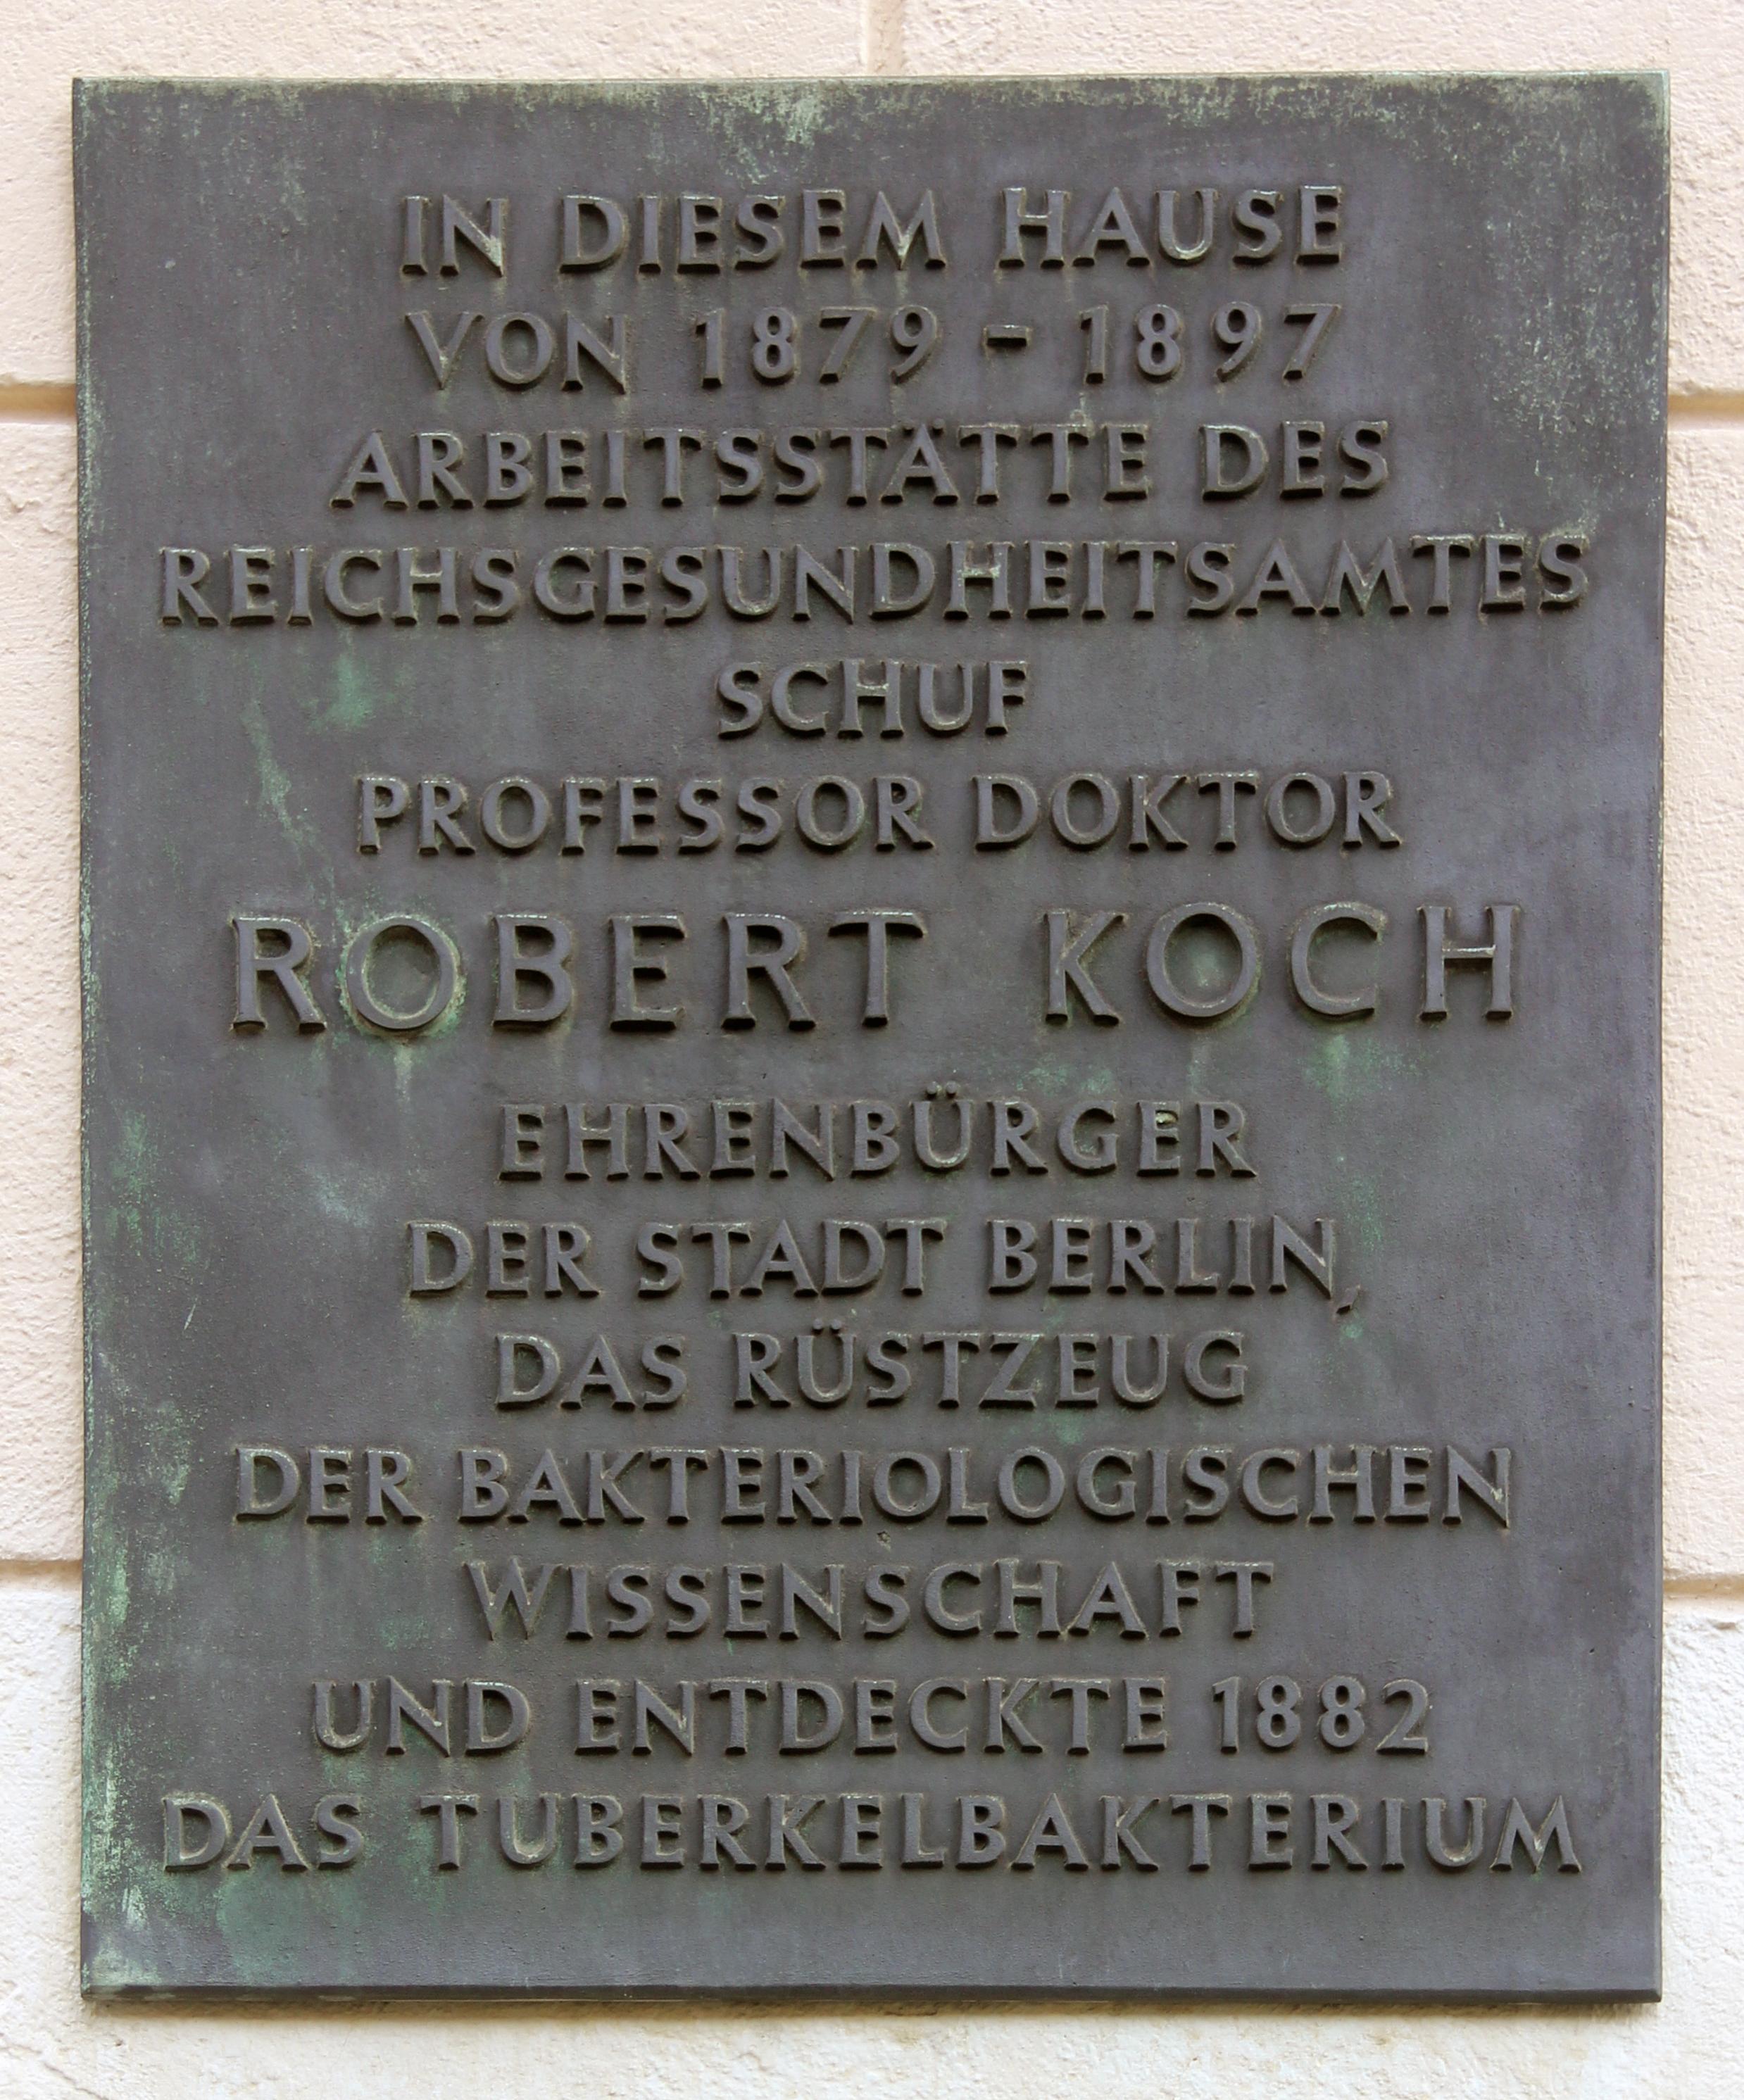 http://upload.wikimedia.org/wikipedia/commons/e/e1/Gedenktafel_Luisenstr_57_Robert_Koch.JPG